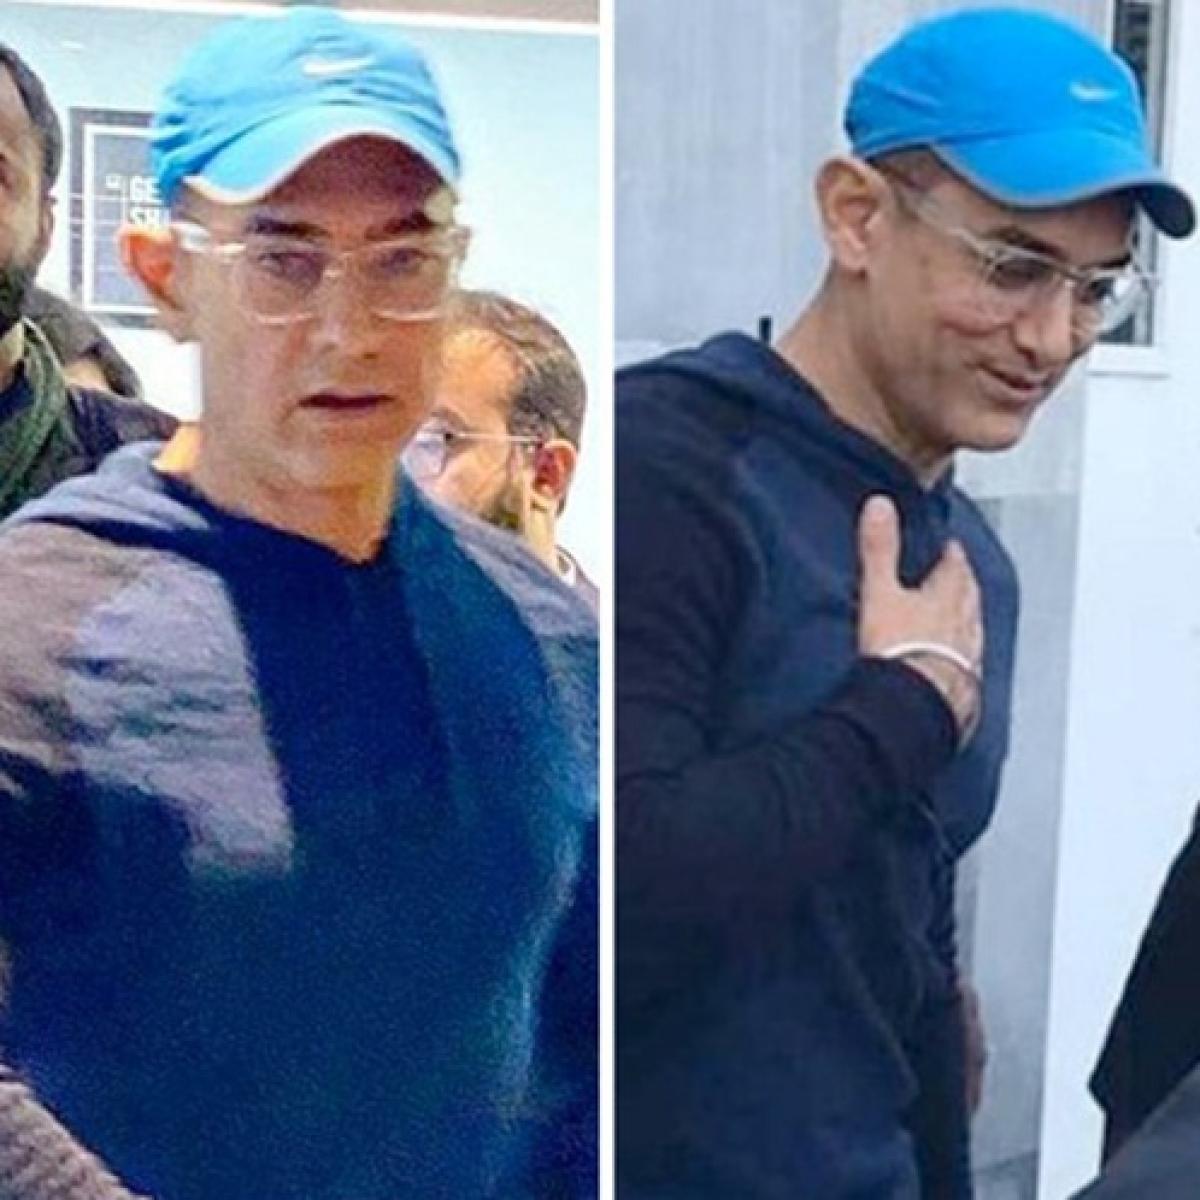 Aamir Khan sports clean-shaven look in 'Laal Singh Chaddha' leaked photos